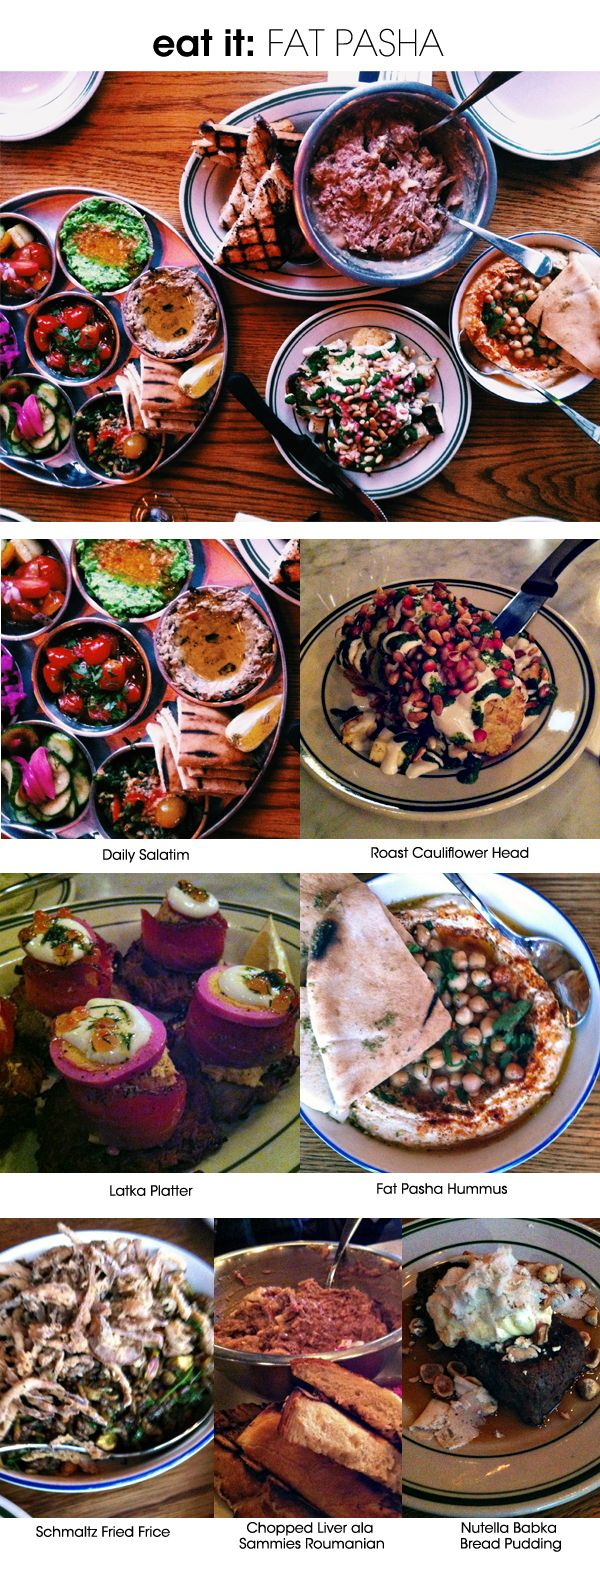 eat it: Fat Pasha in Toronto, a blend of Israeli and Sephardic food